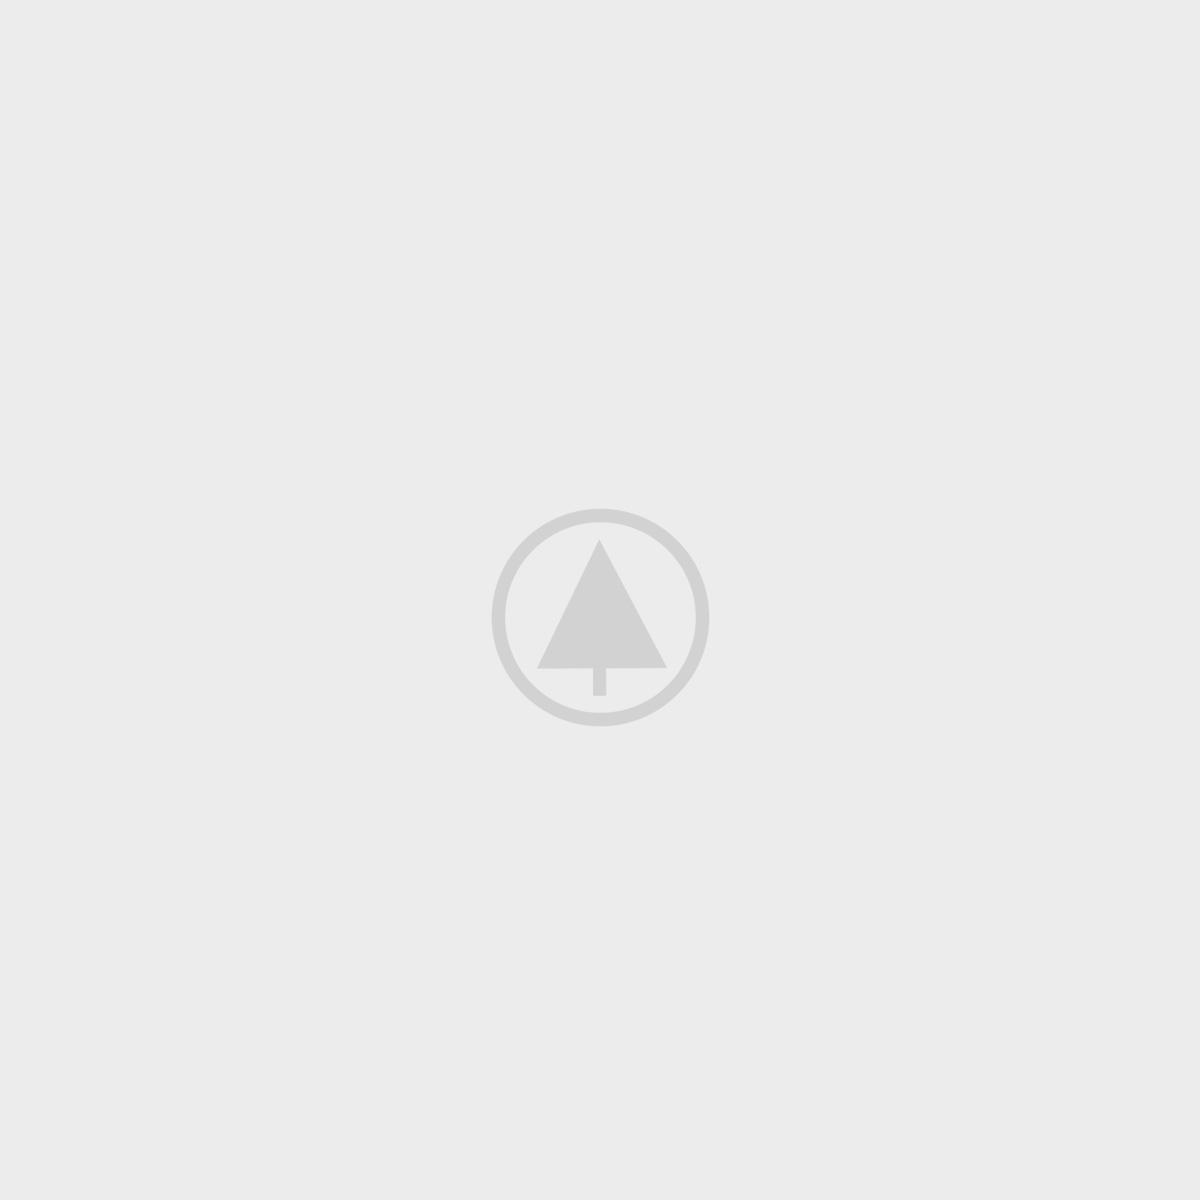 IELTS Online Coching Training - Et vestibulum quis a suspendisse - 6